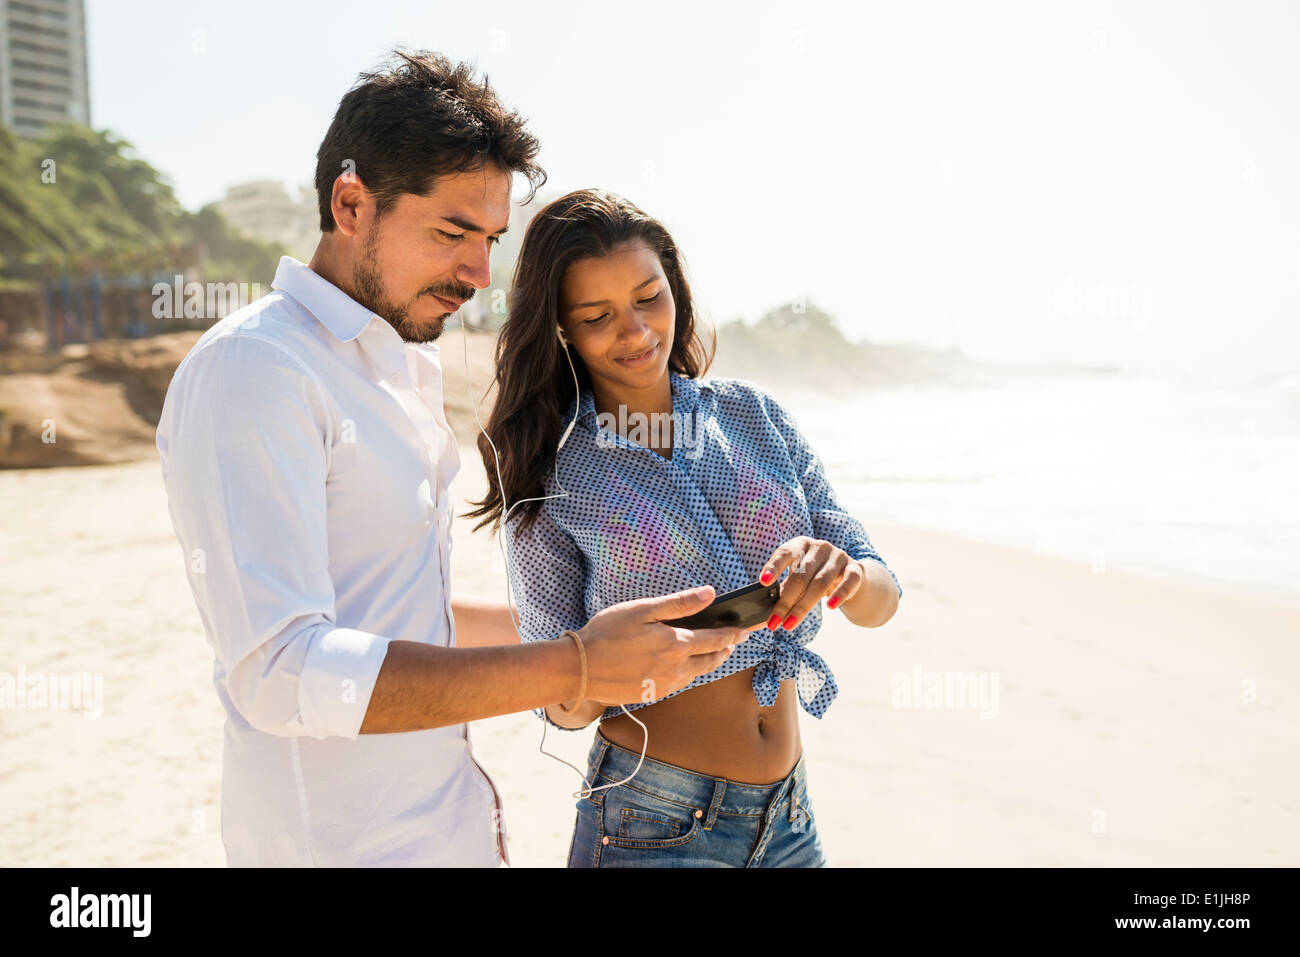 Couple de la musique à partir de smartphone, Arpoador beach, Rio de Janeiro, Brésil Photo Stock